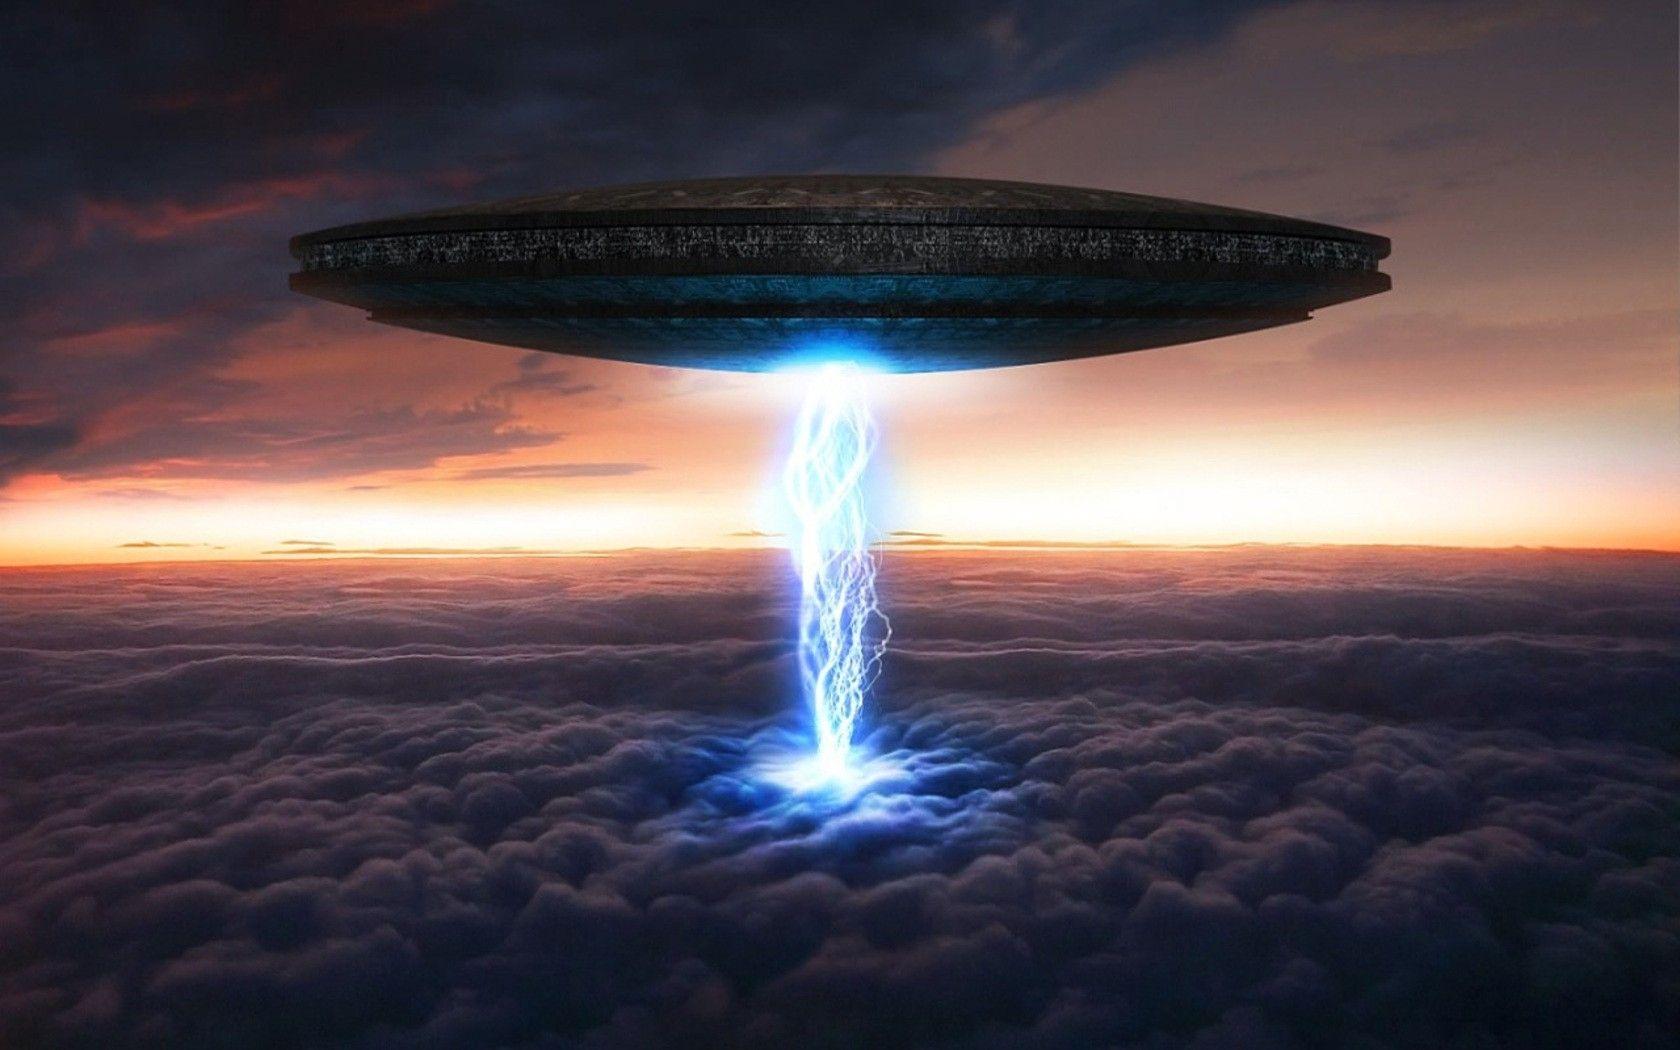 Sci fi aliens ufo spaceship spacecraft sky clouds art invasion 1680x1050